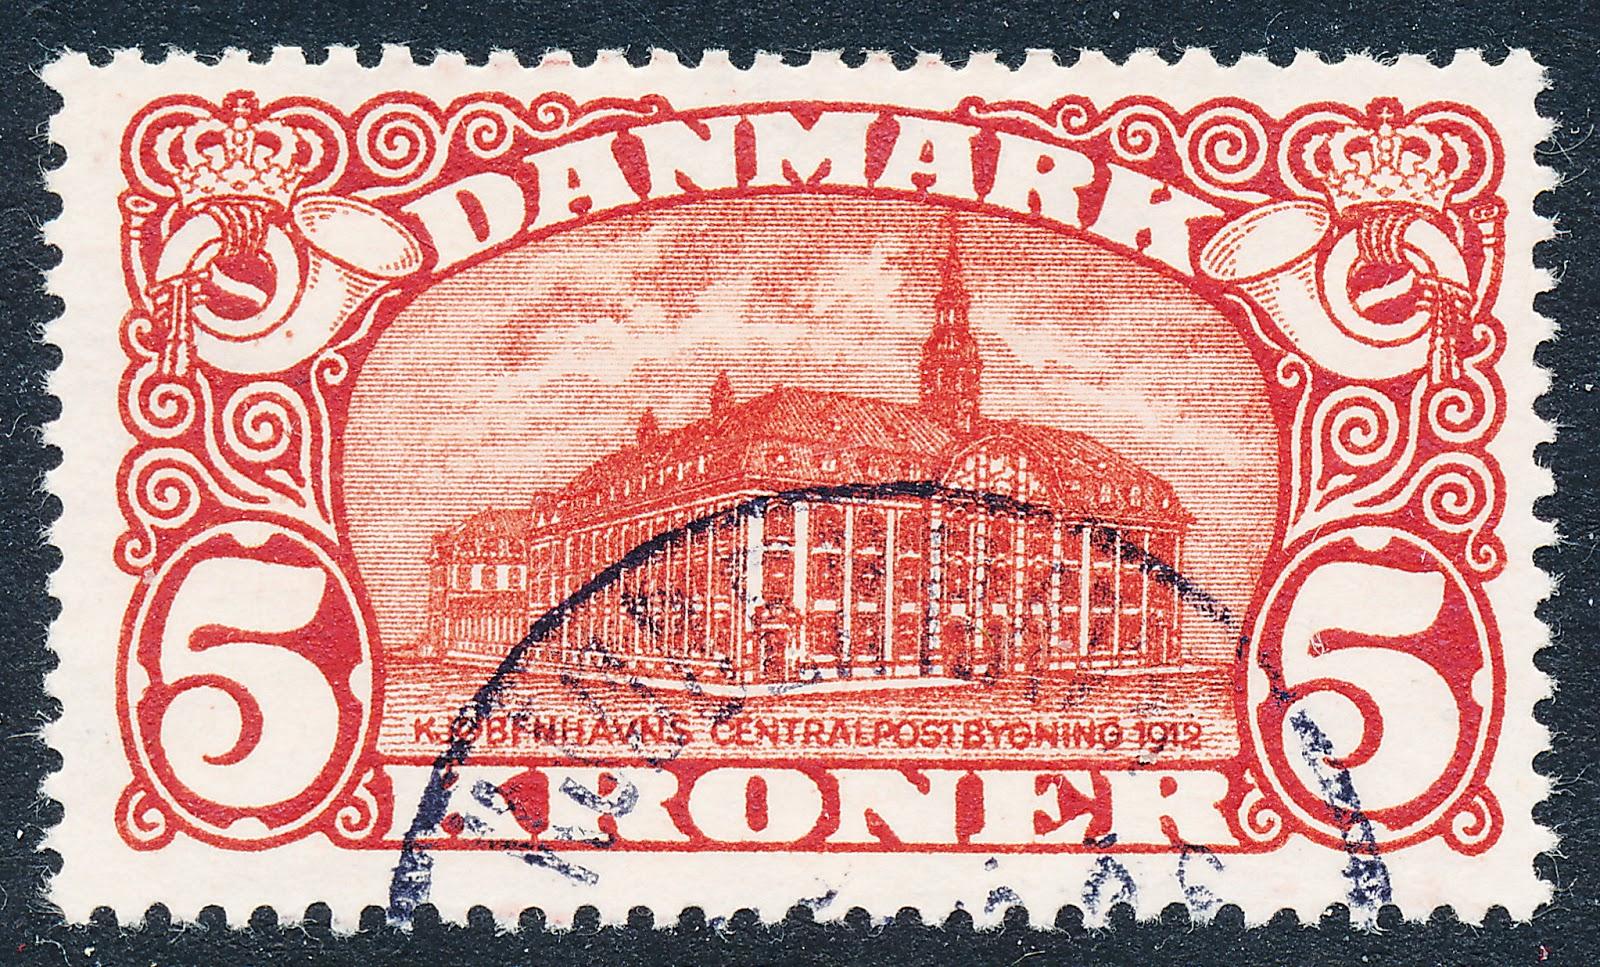 nzpo stamp wikipedia stamps wiki office demonitisation demonetization post postage